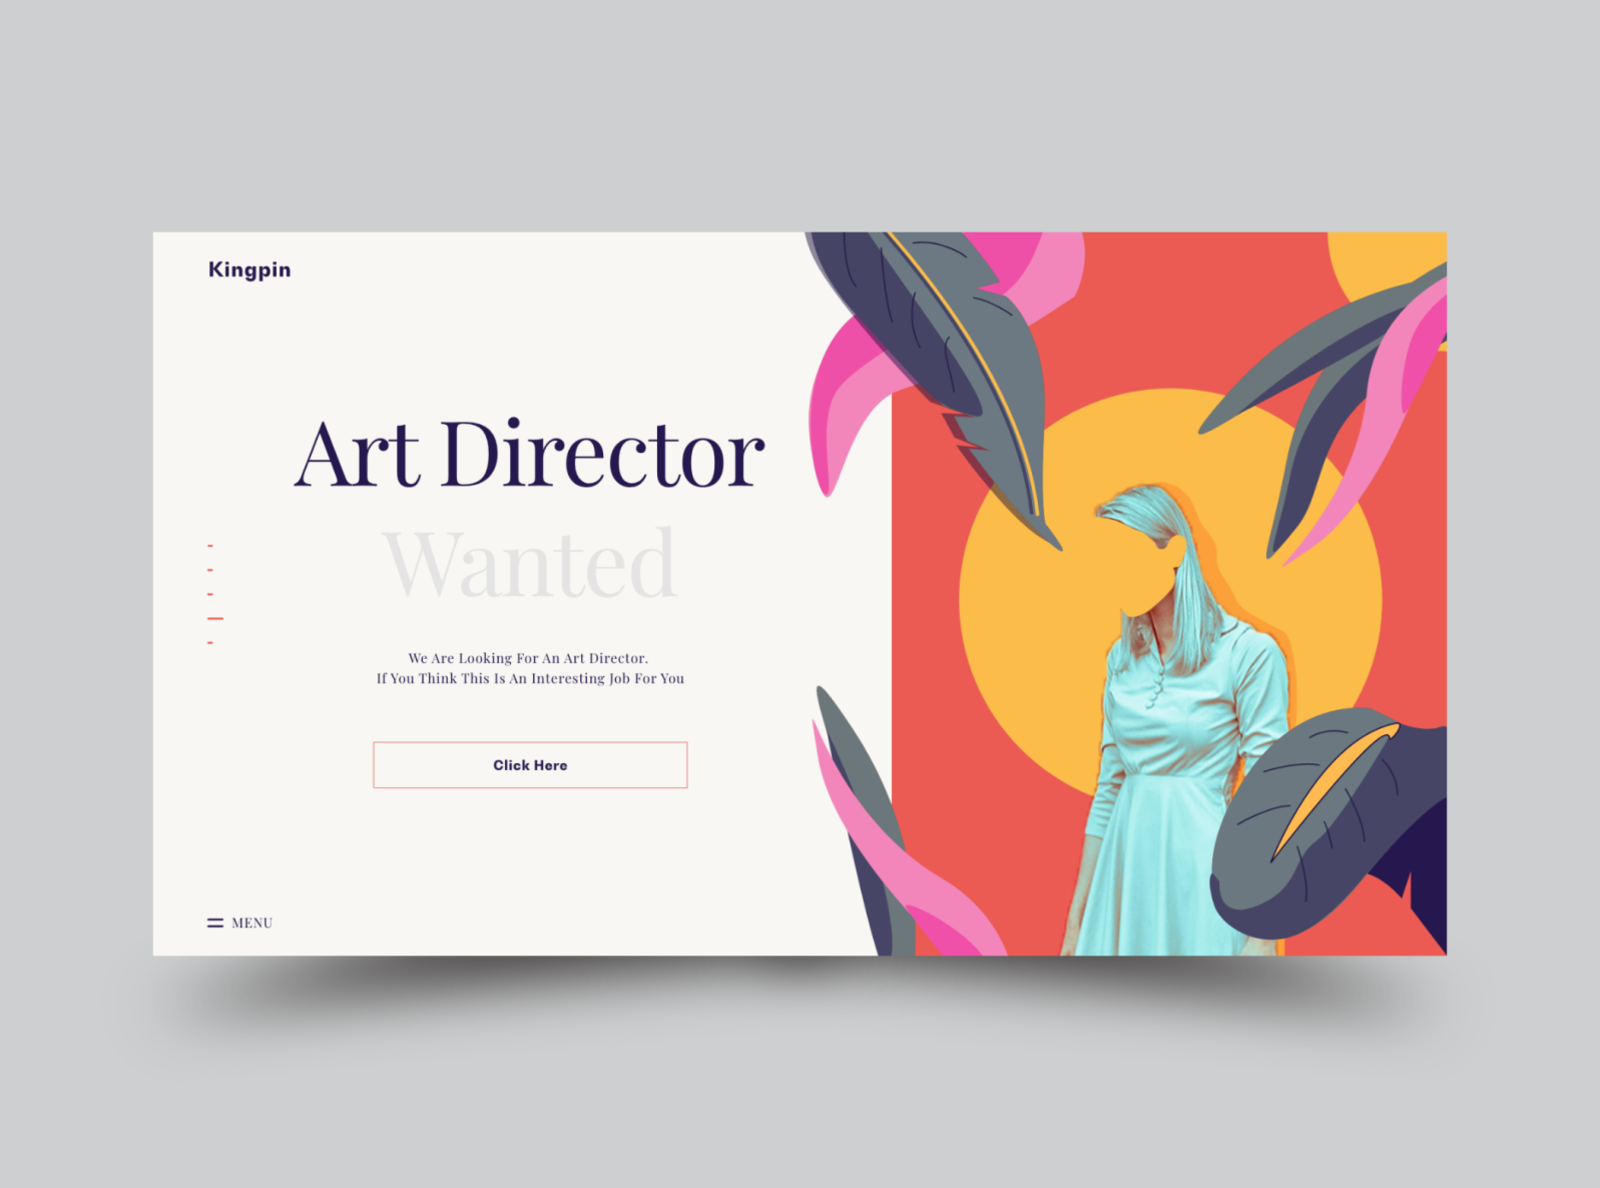 Kingpin menubar vacancies vacancy girl red yellow flowers flower job artdirector kingpin illustration vector website web typography ux ui design